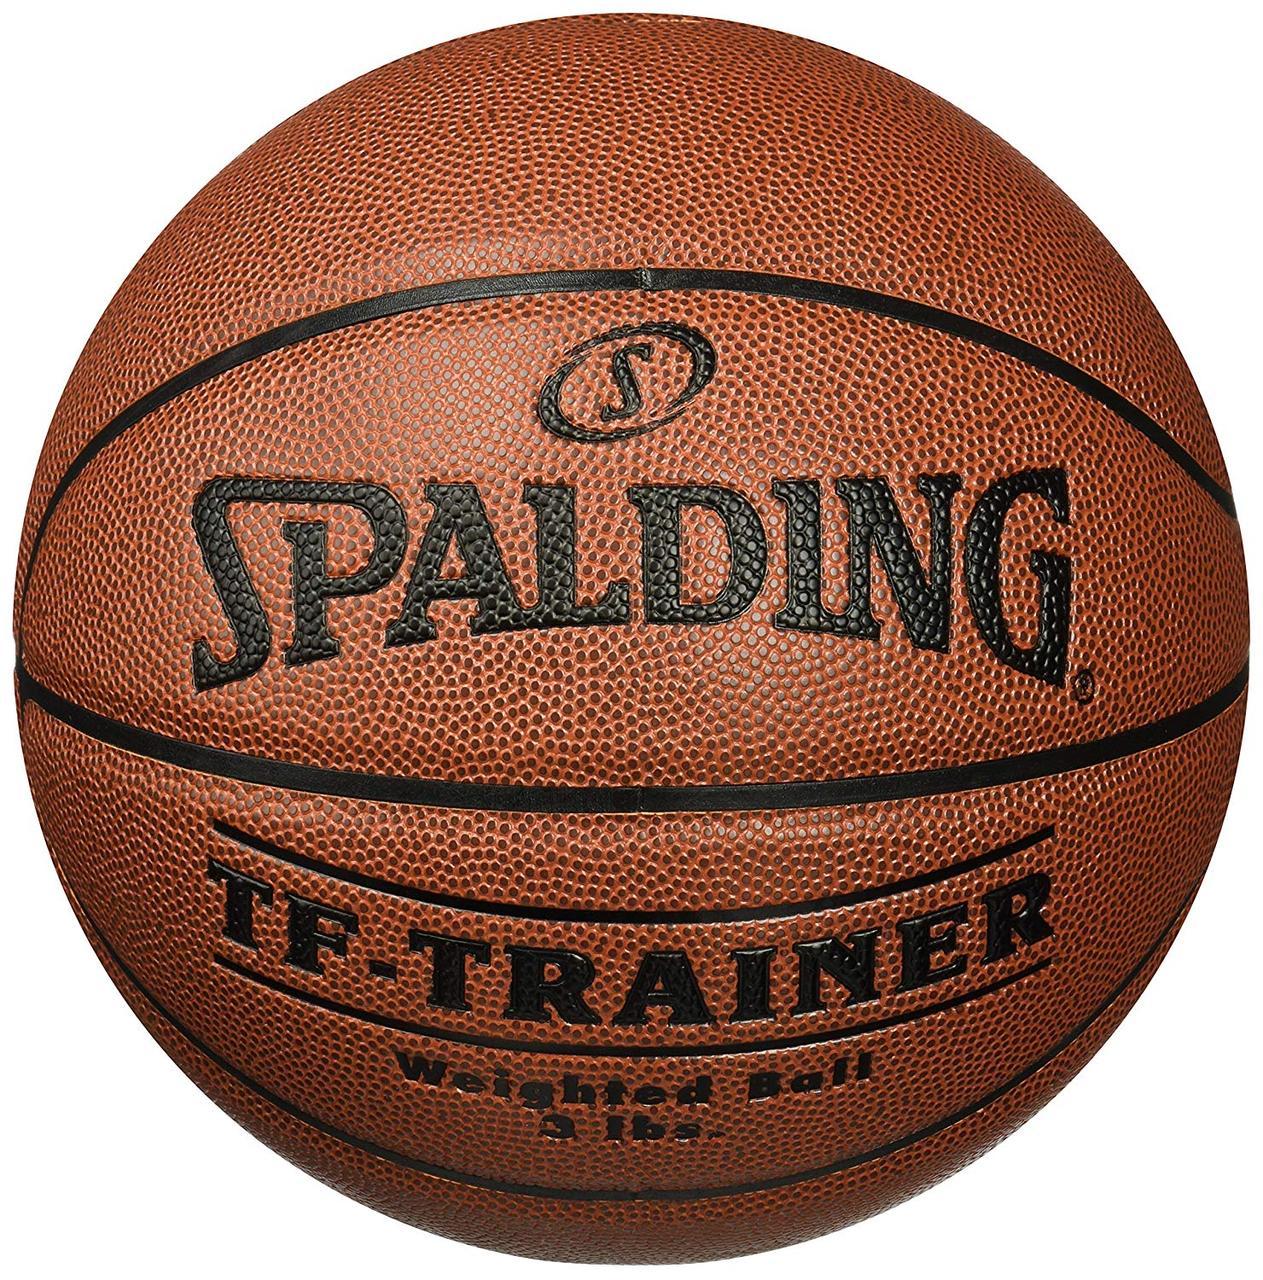 Мяч баскетбольный Spalding NBA Trainer Heavy Ball размер 7